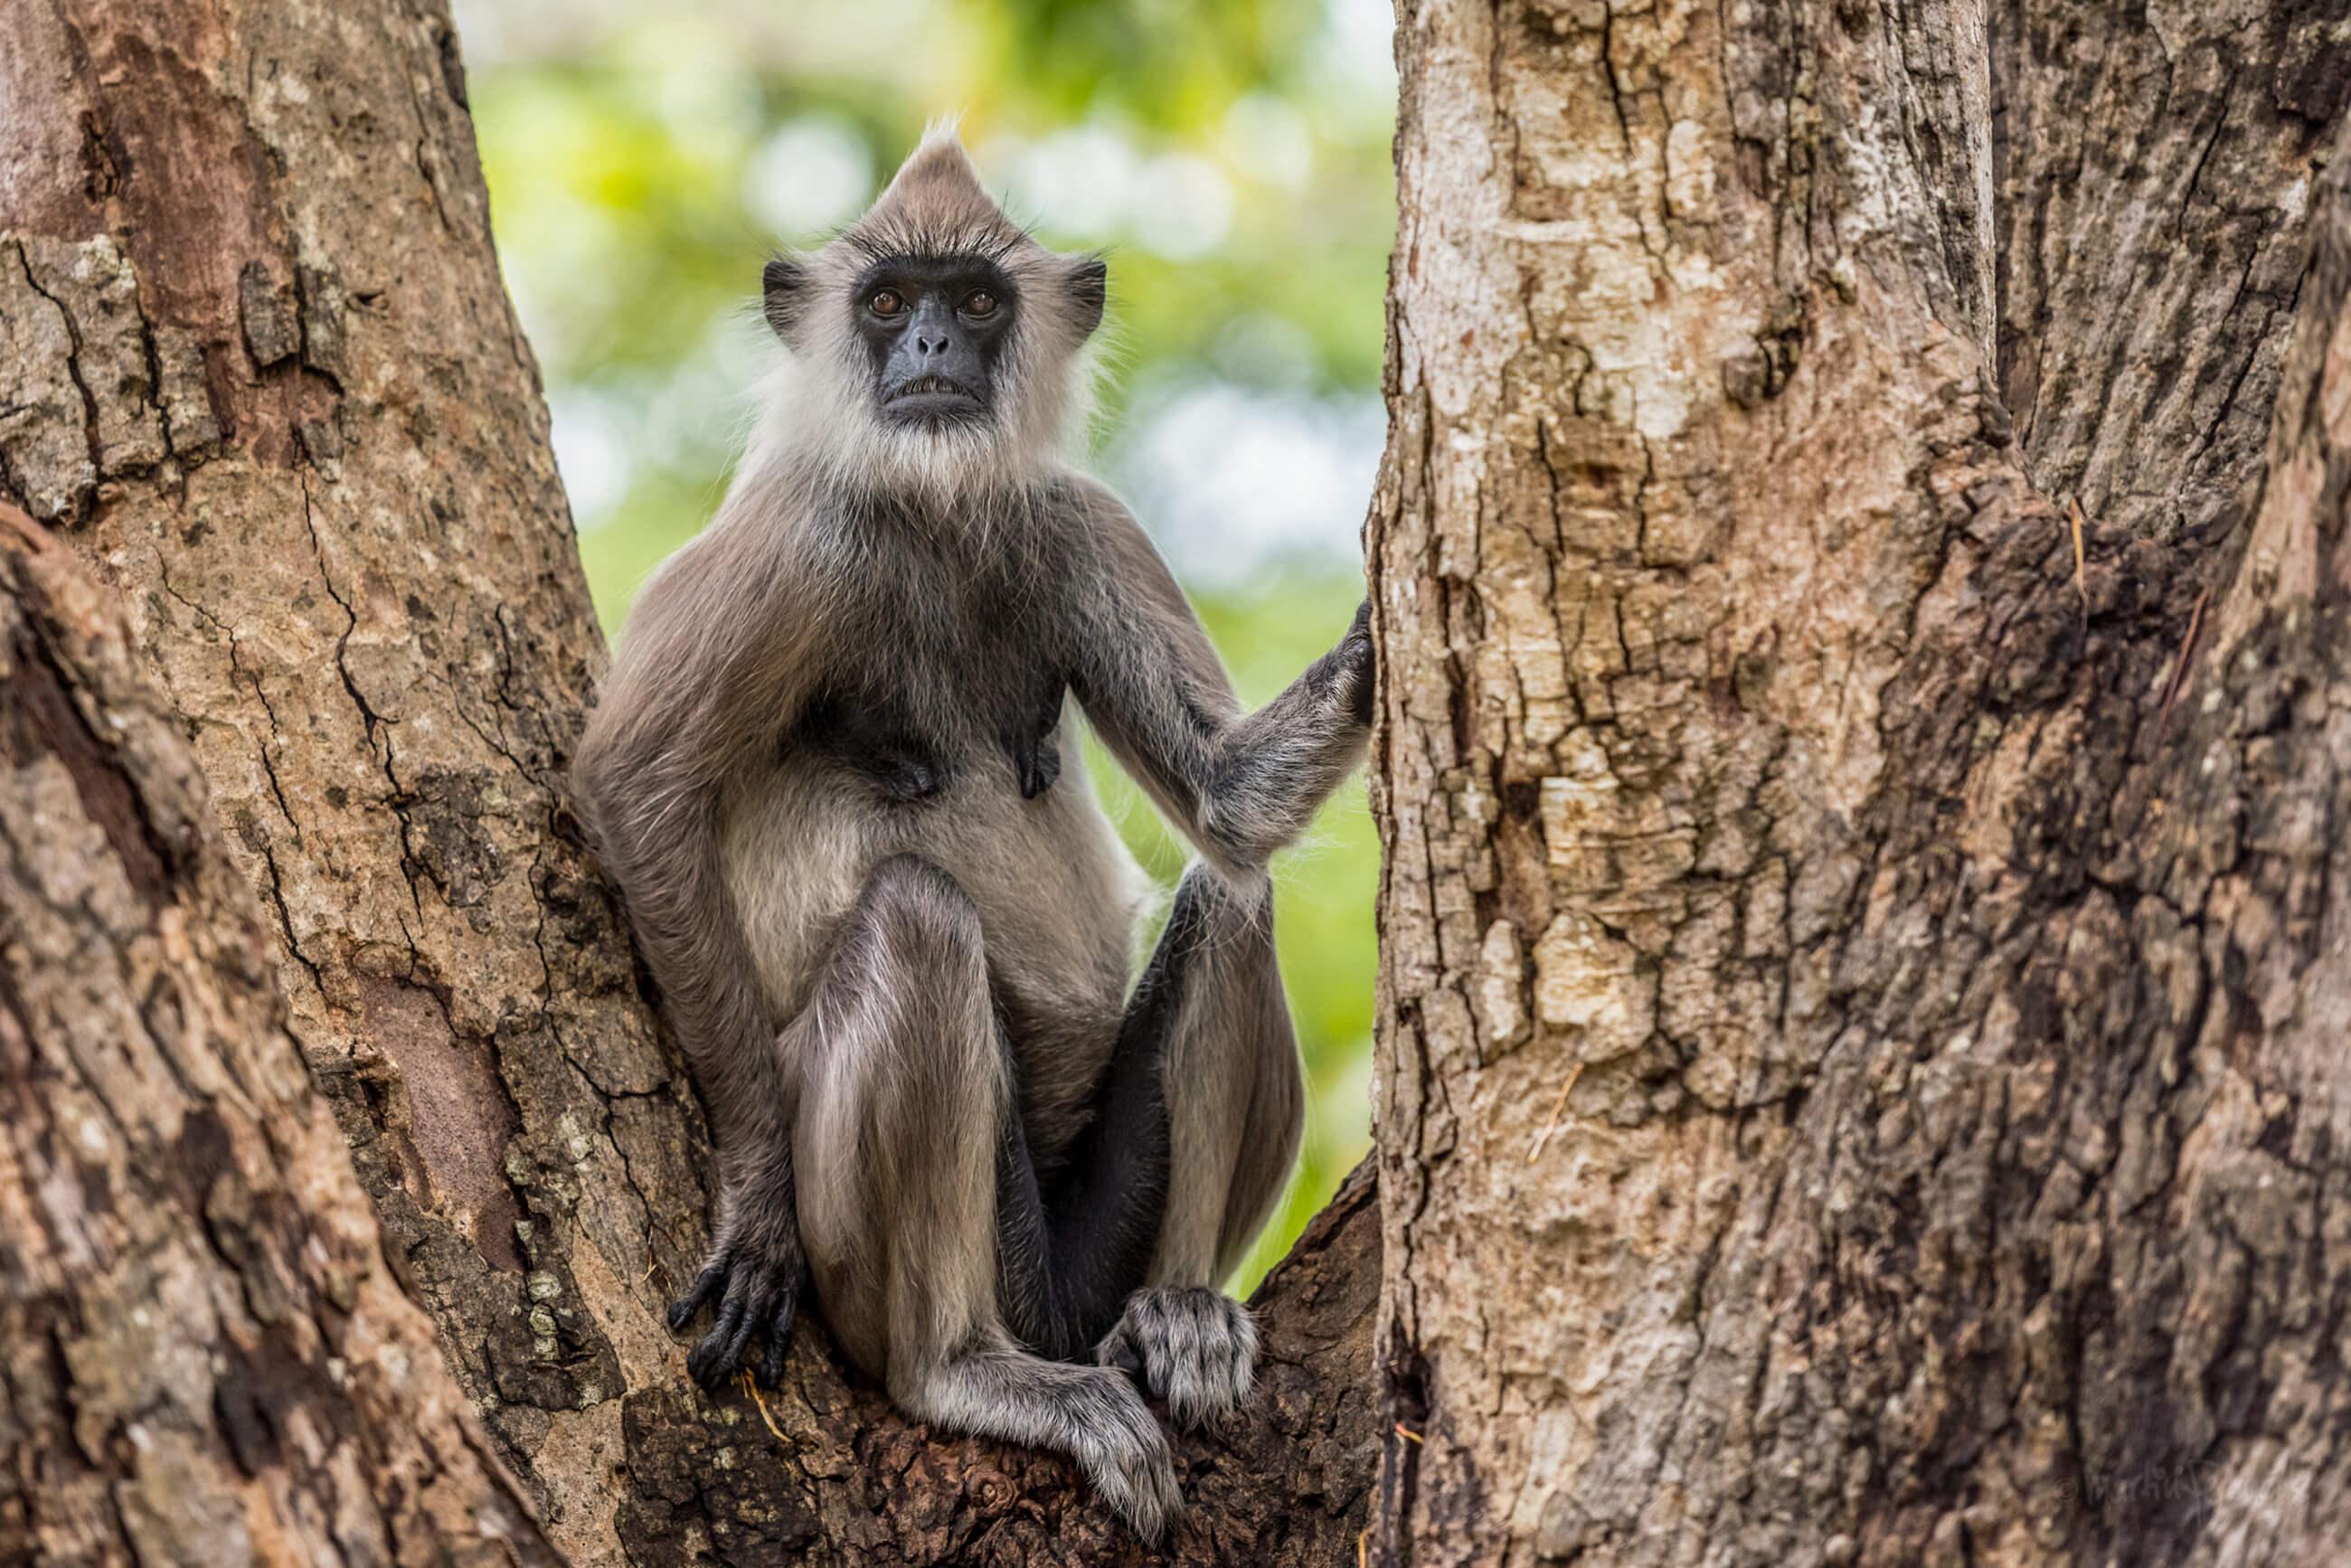 https://bubo.sk/uploads/galleries/7327/martinferencik_srilanka_dsc7606.jpg